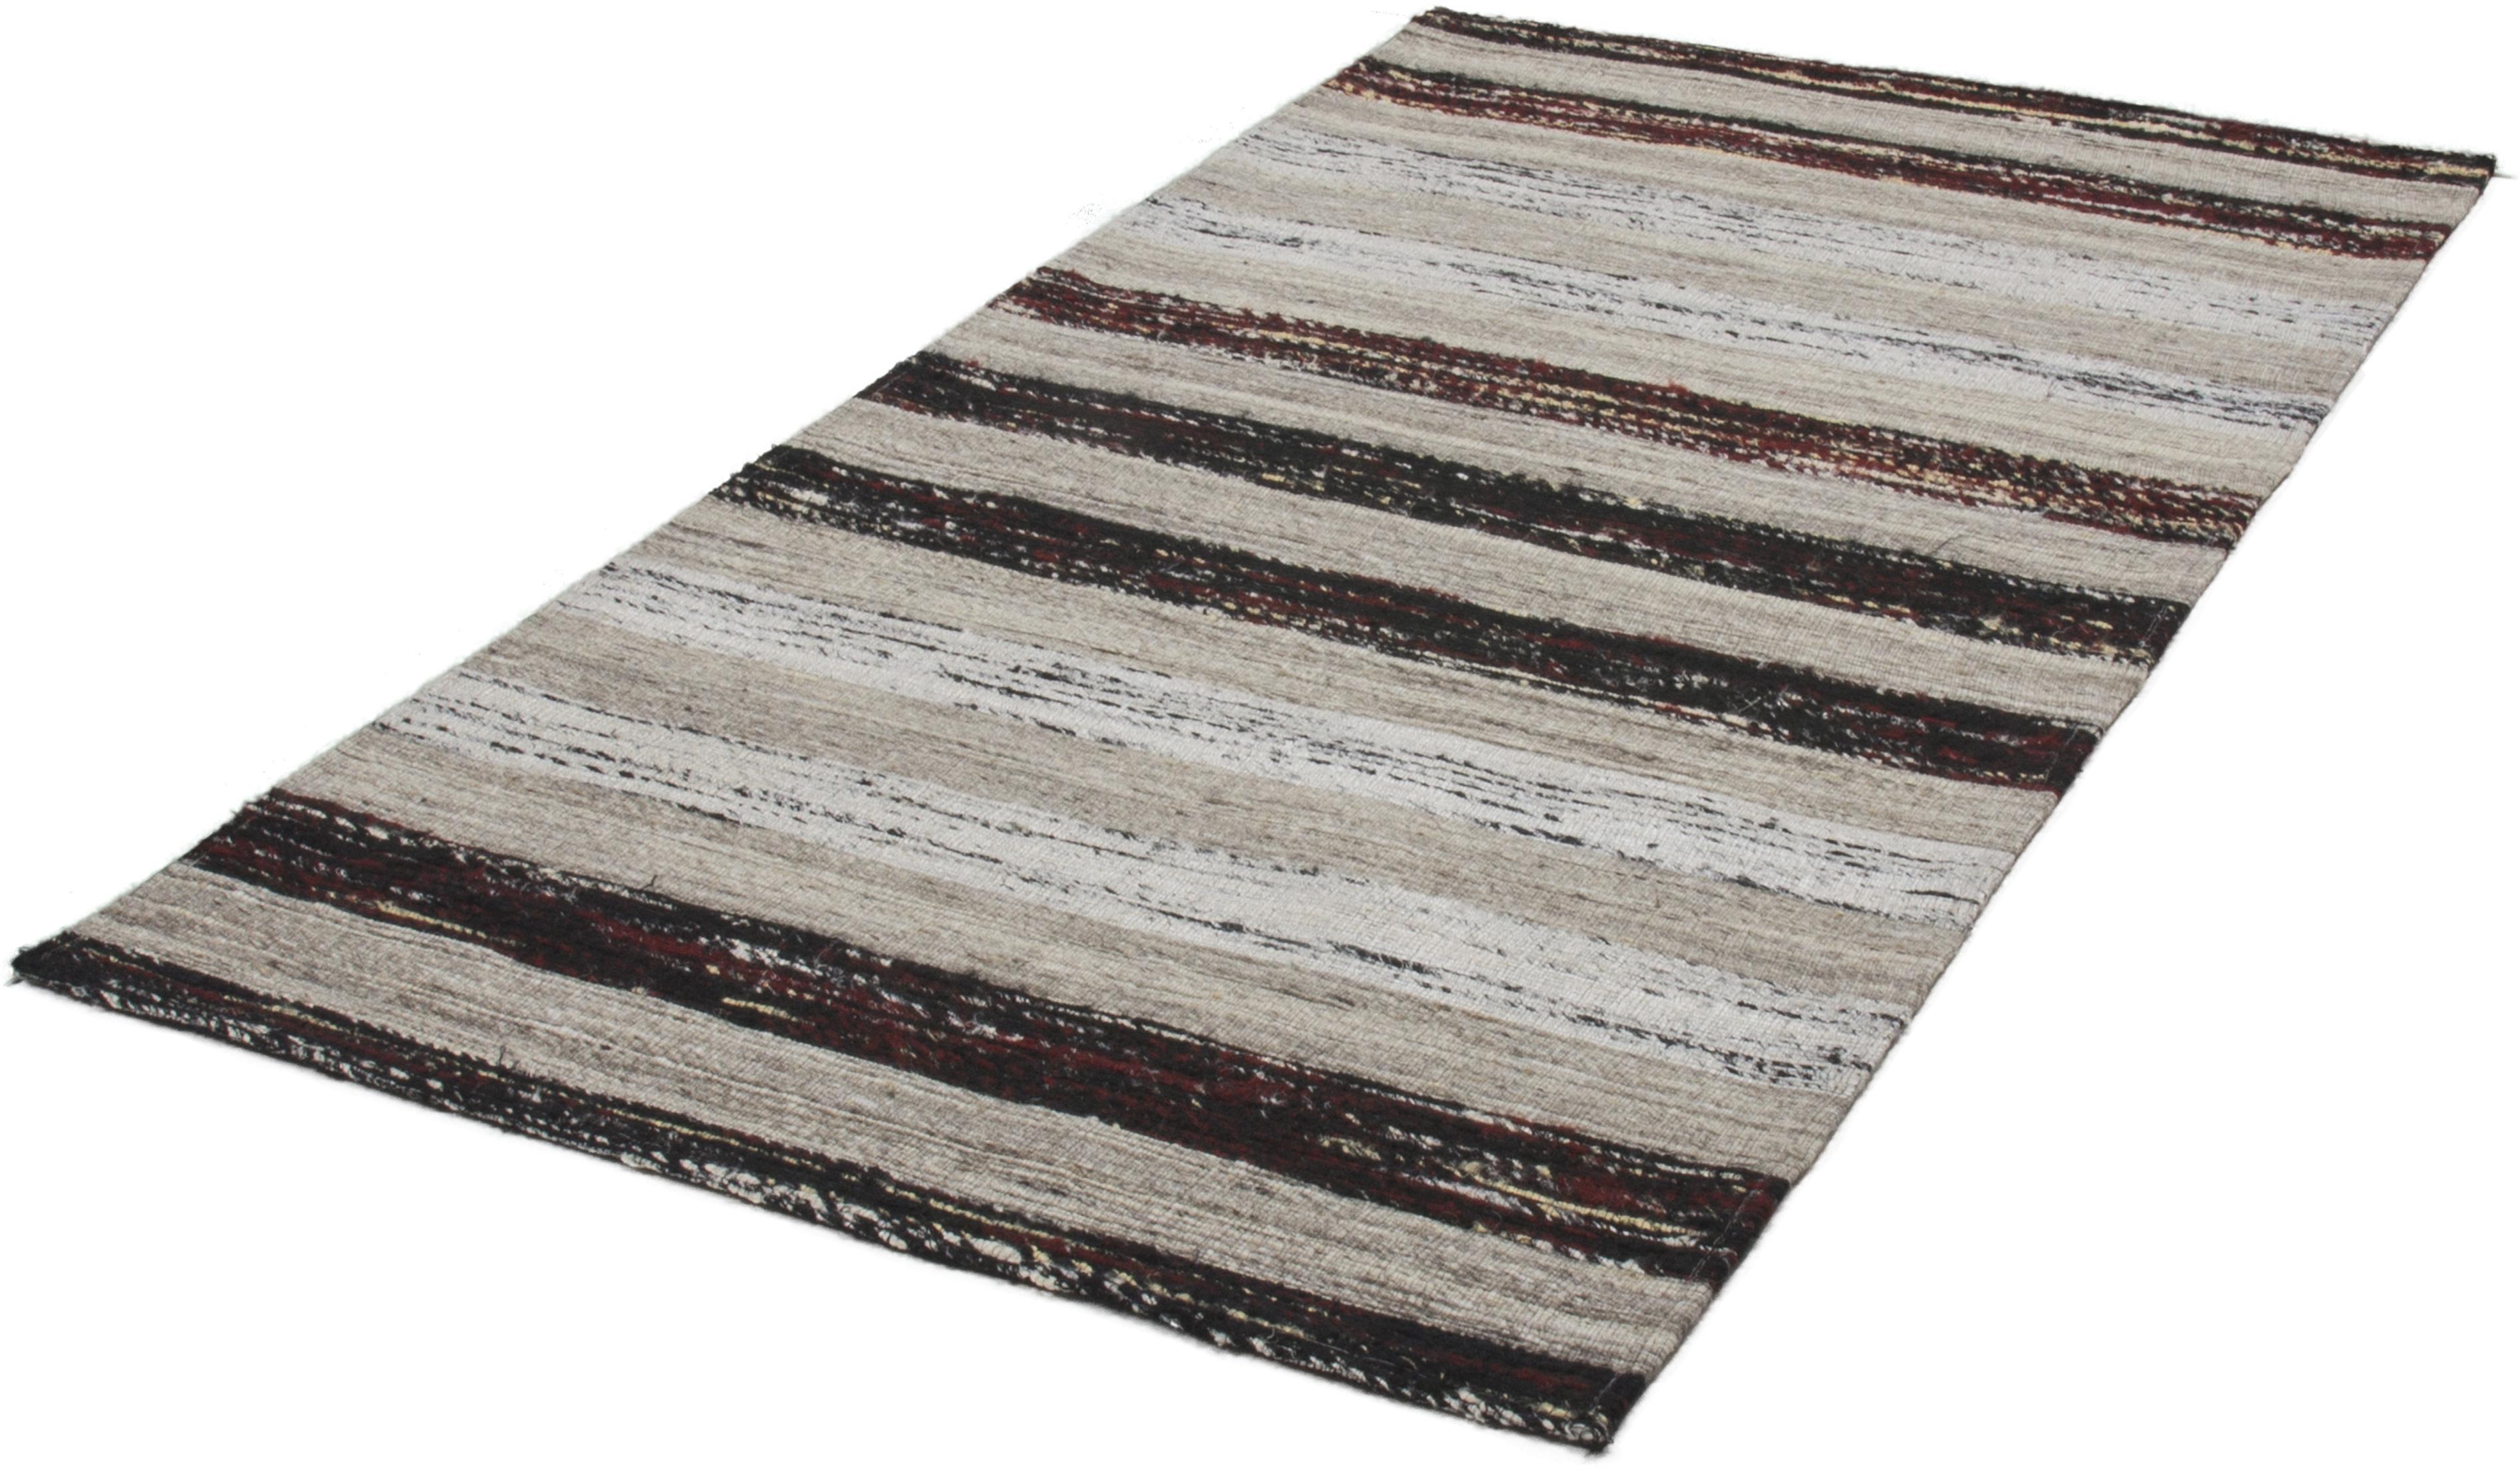 Teppich Duarte 210 Kayoom rechteckig Höhe 16 mm handgewebt